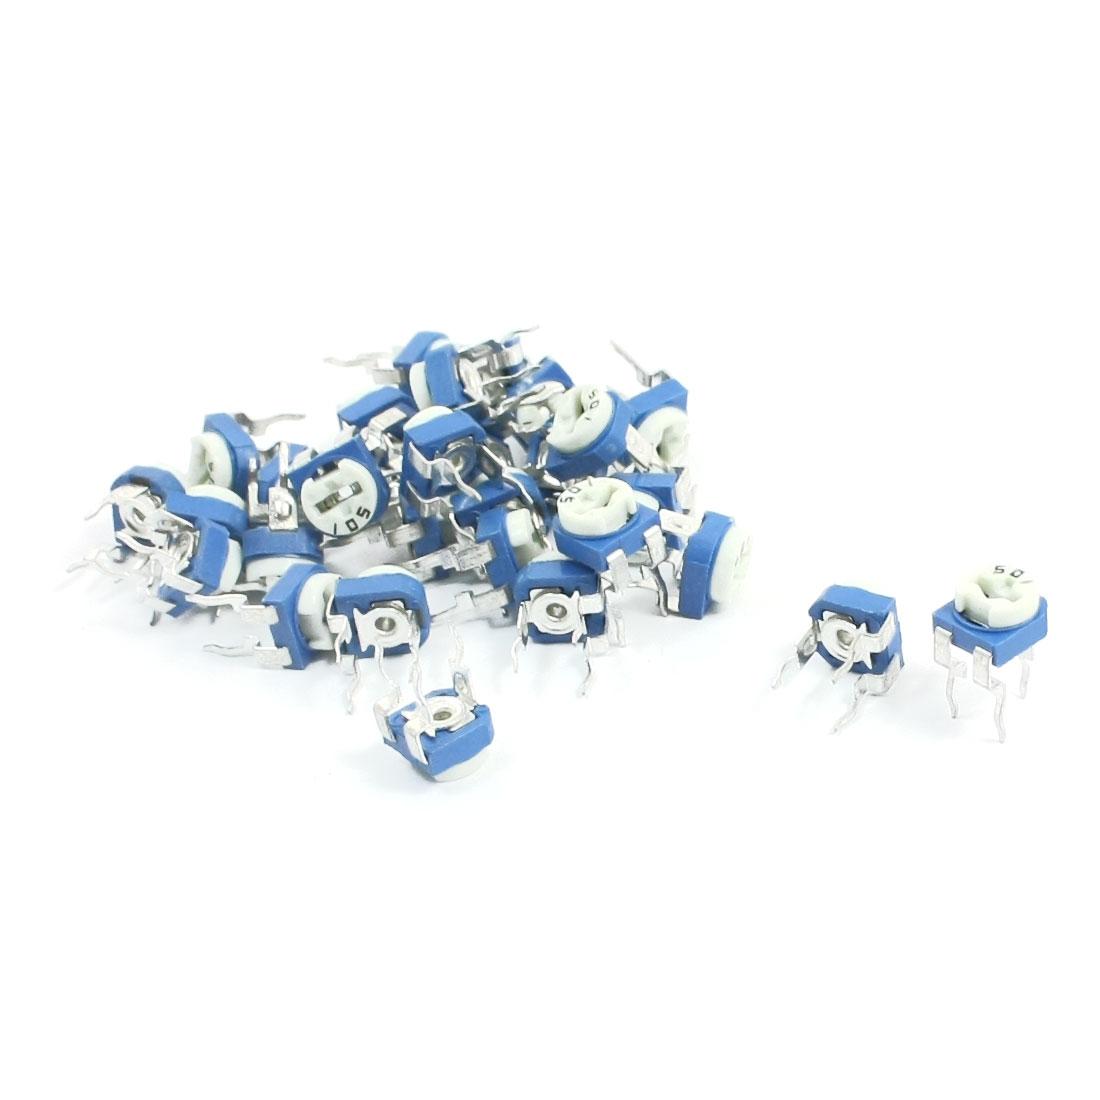 30x Trim Pot Variable Resistor Horizontal Trimmer Potentiometer 500 Ohm